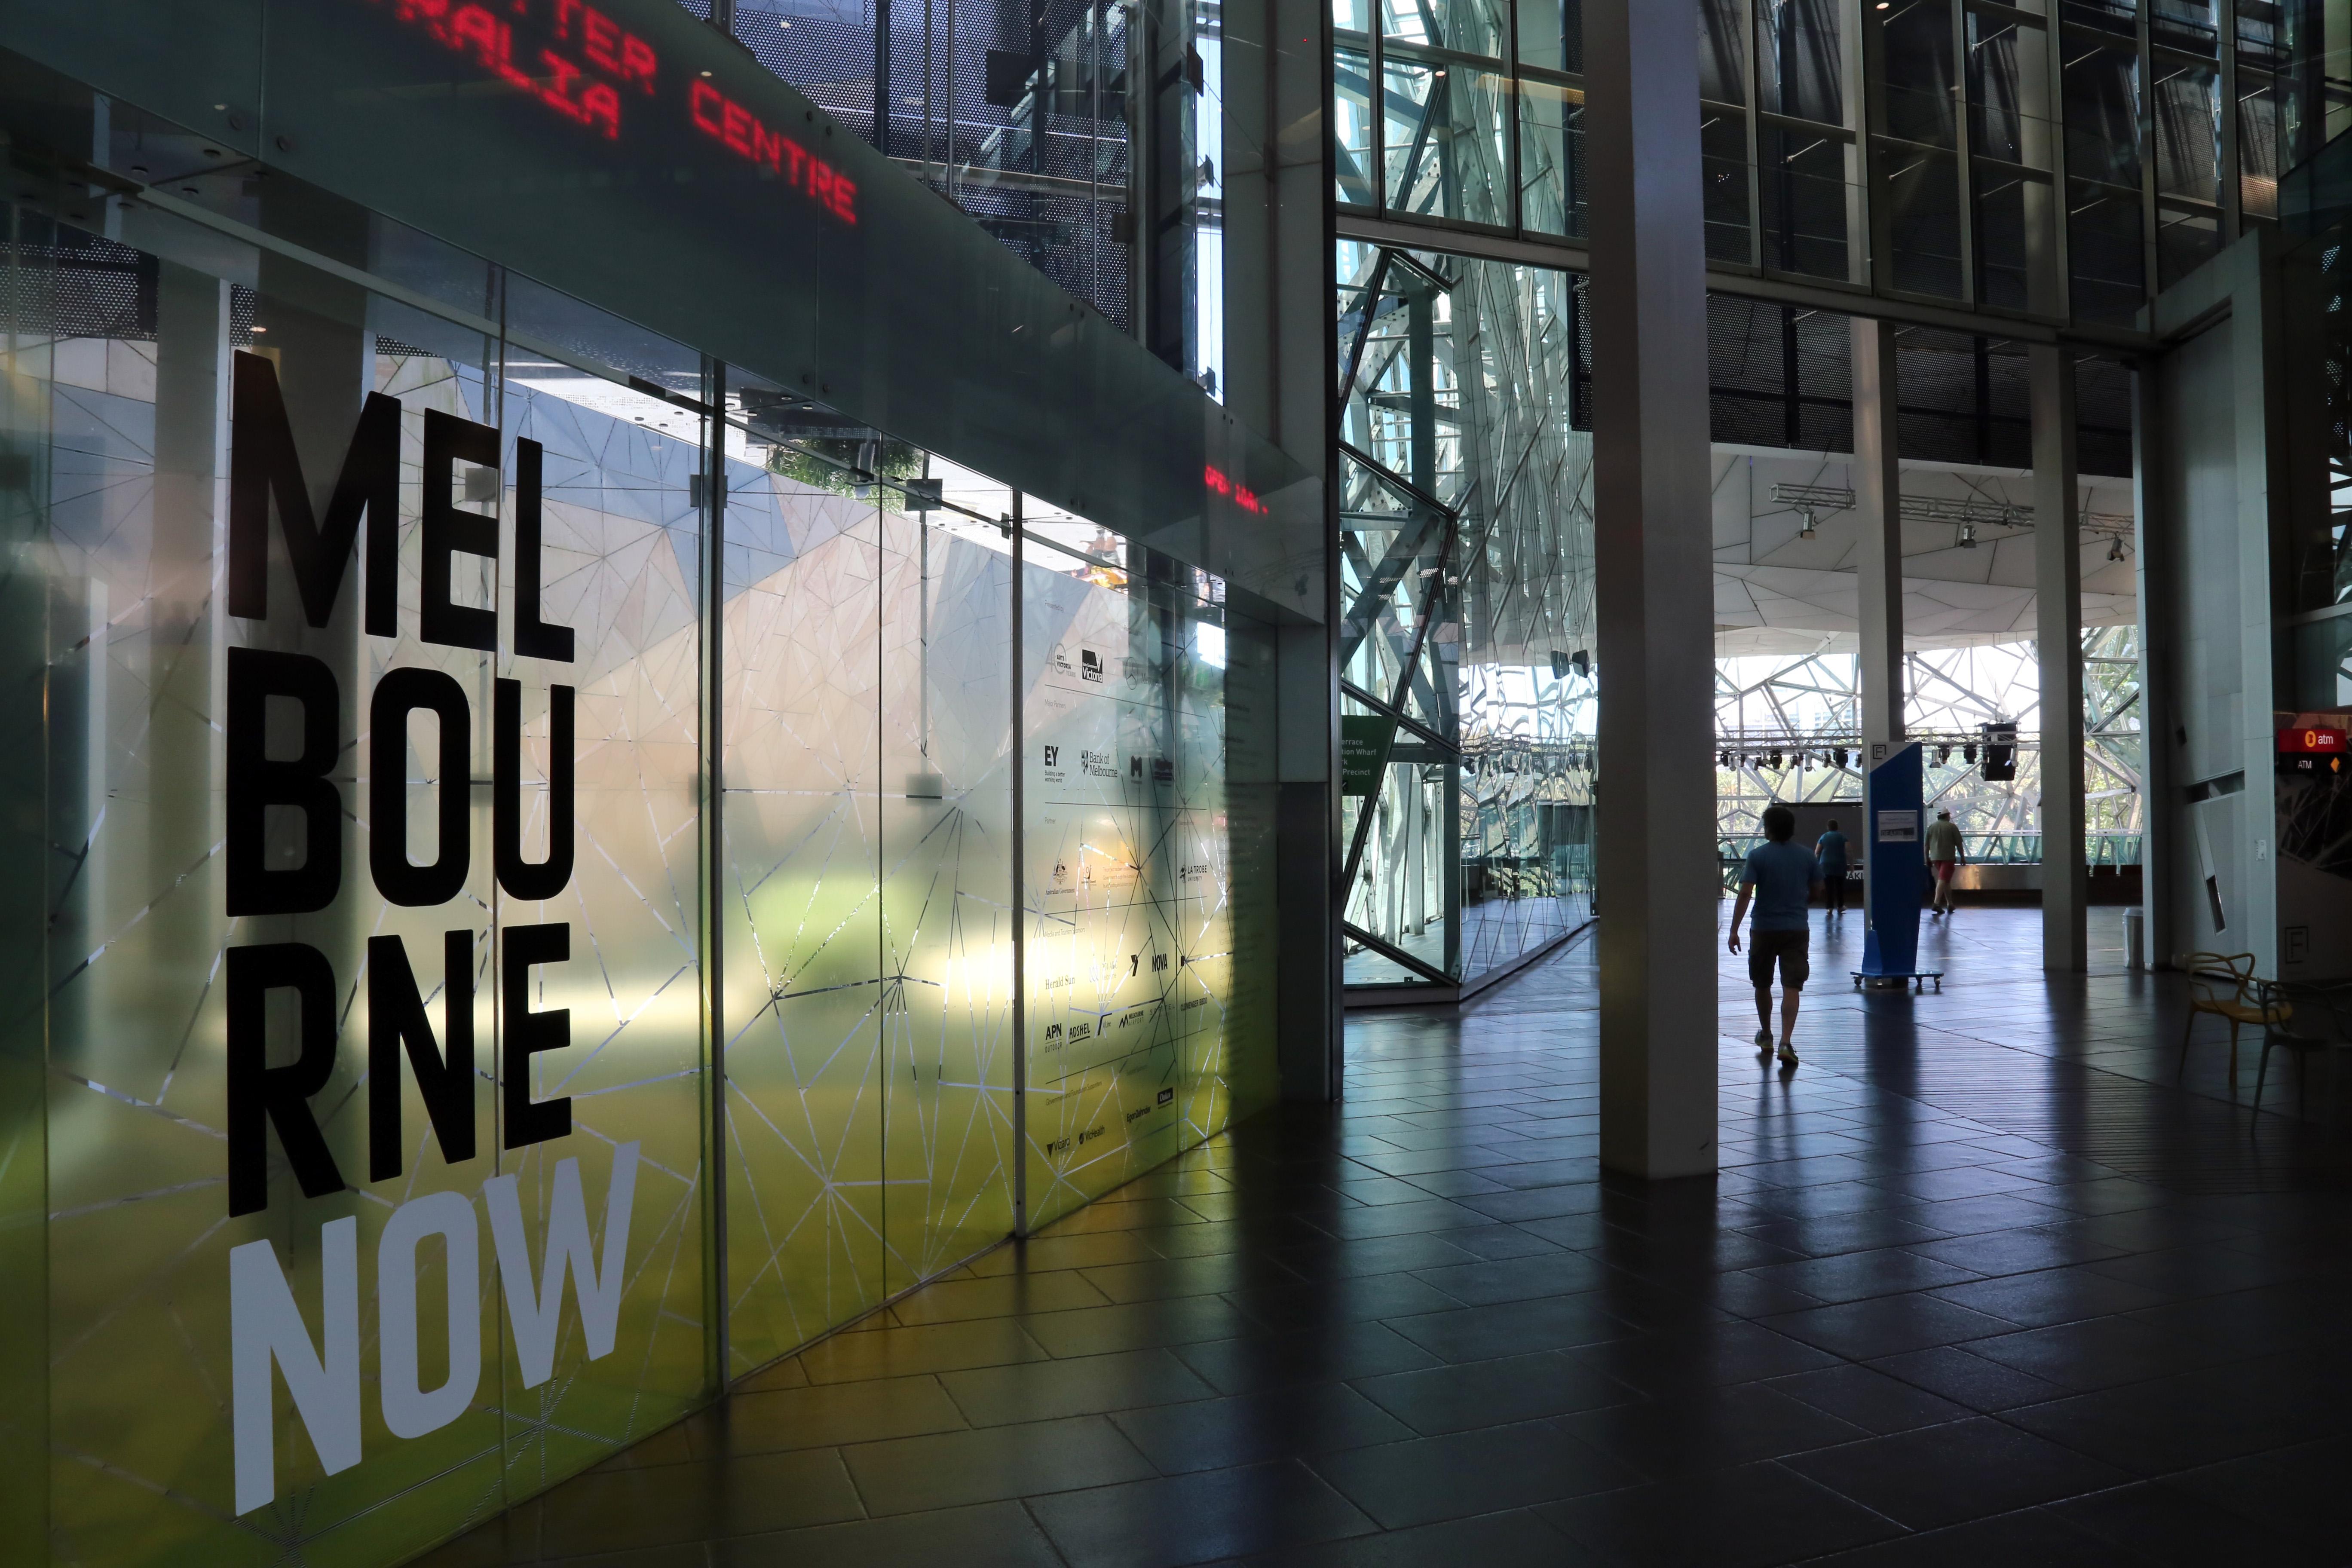 NGV and ACMI -- Art Centrals of Australia